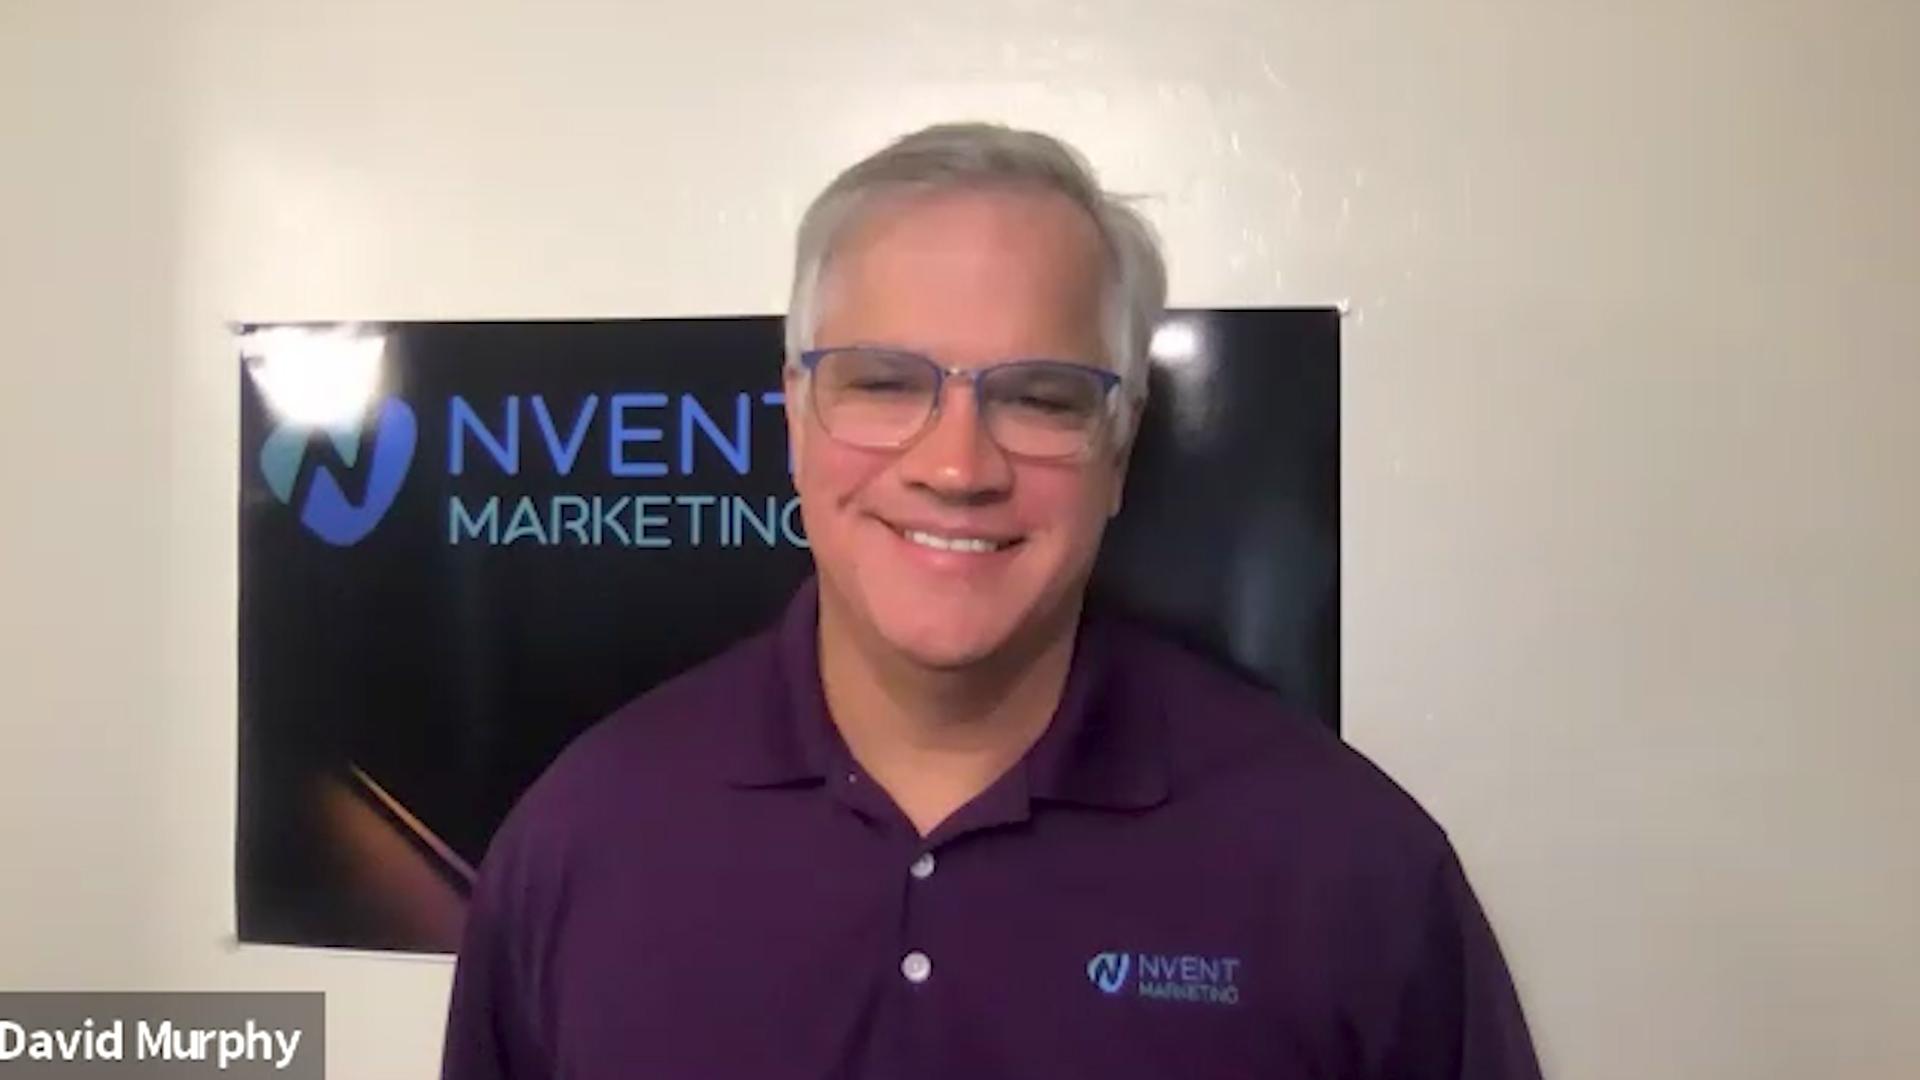 Video preview: Long-time Marketing Expert David Murphy Shares Digital Marketing Strategies